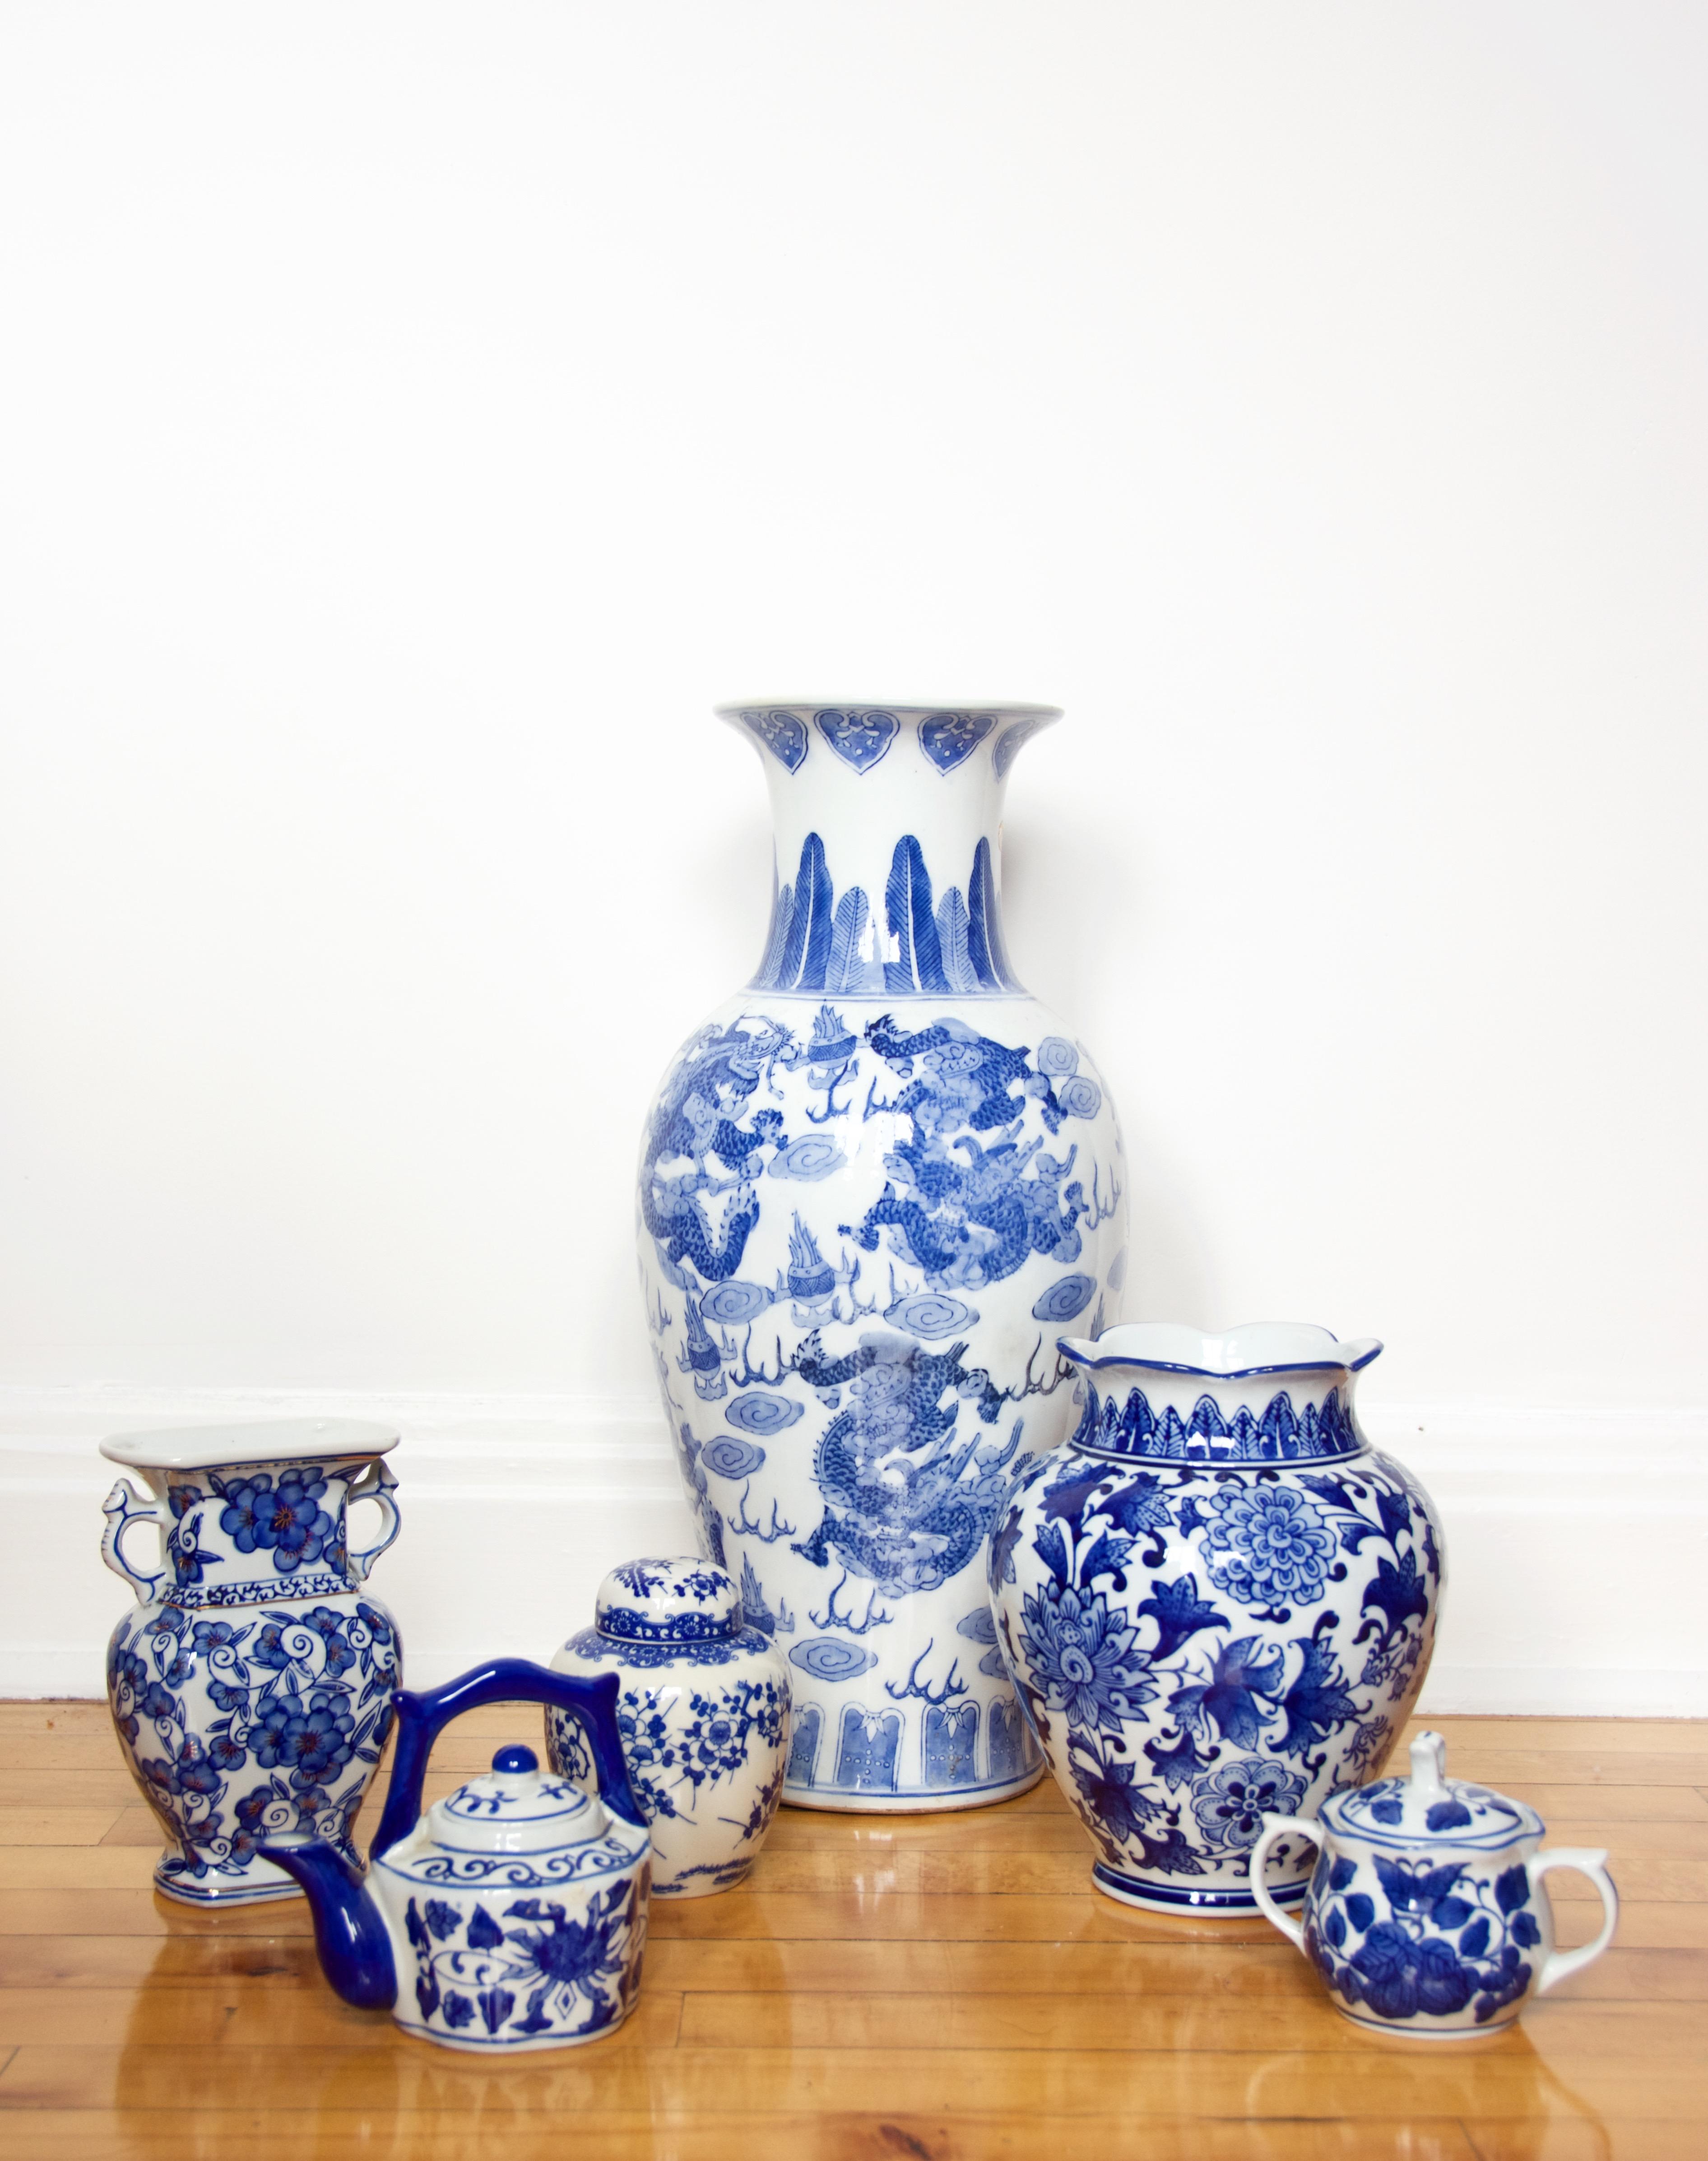 blue and white china porcelain pottery vase jar chinoiserie 3 (1)